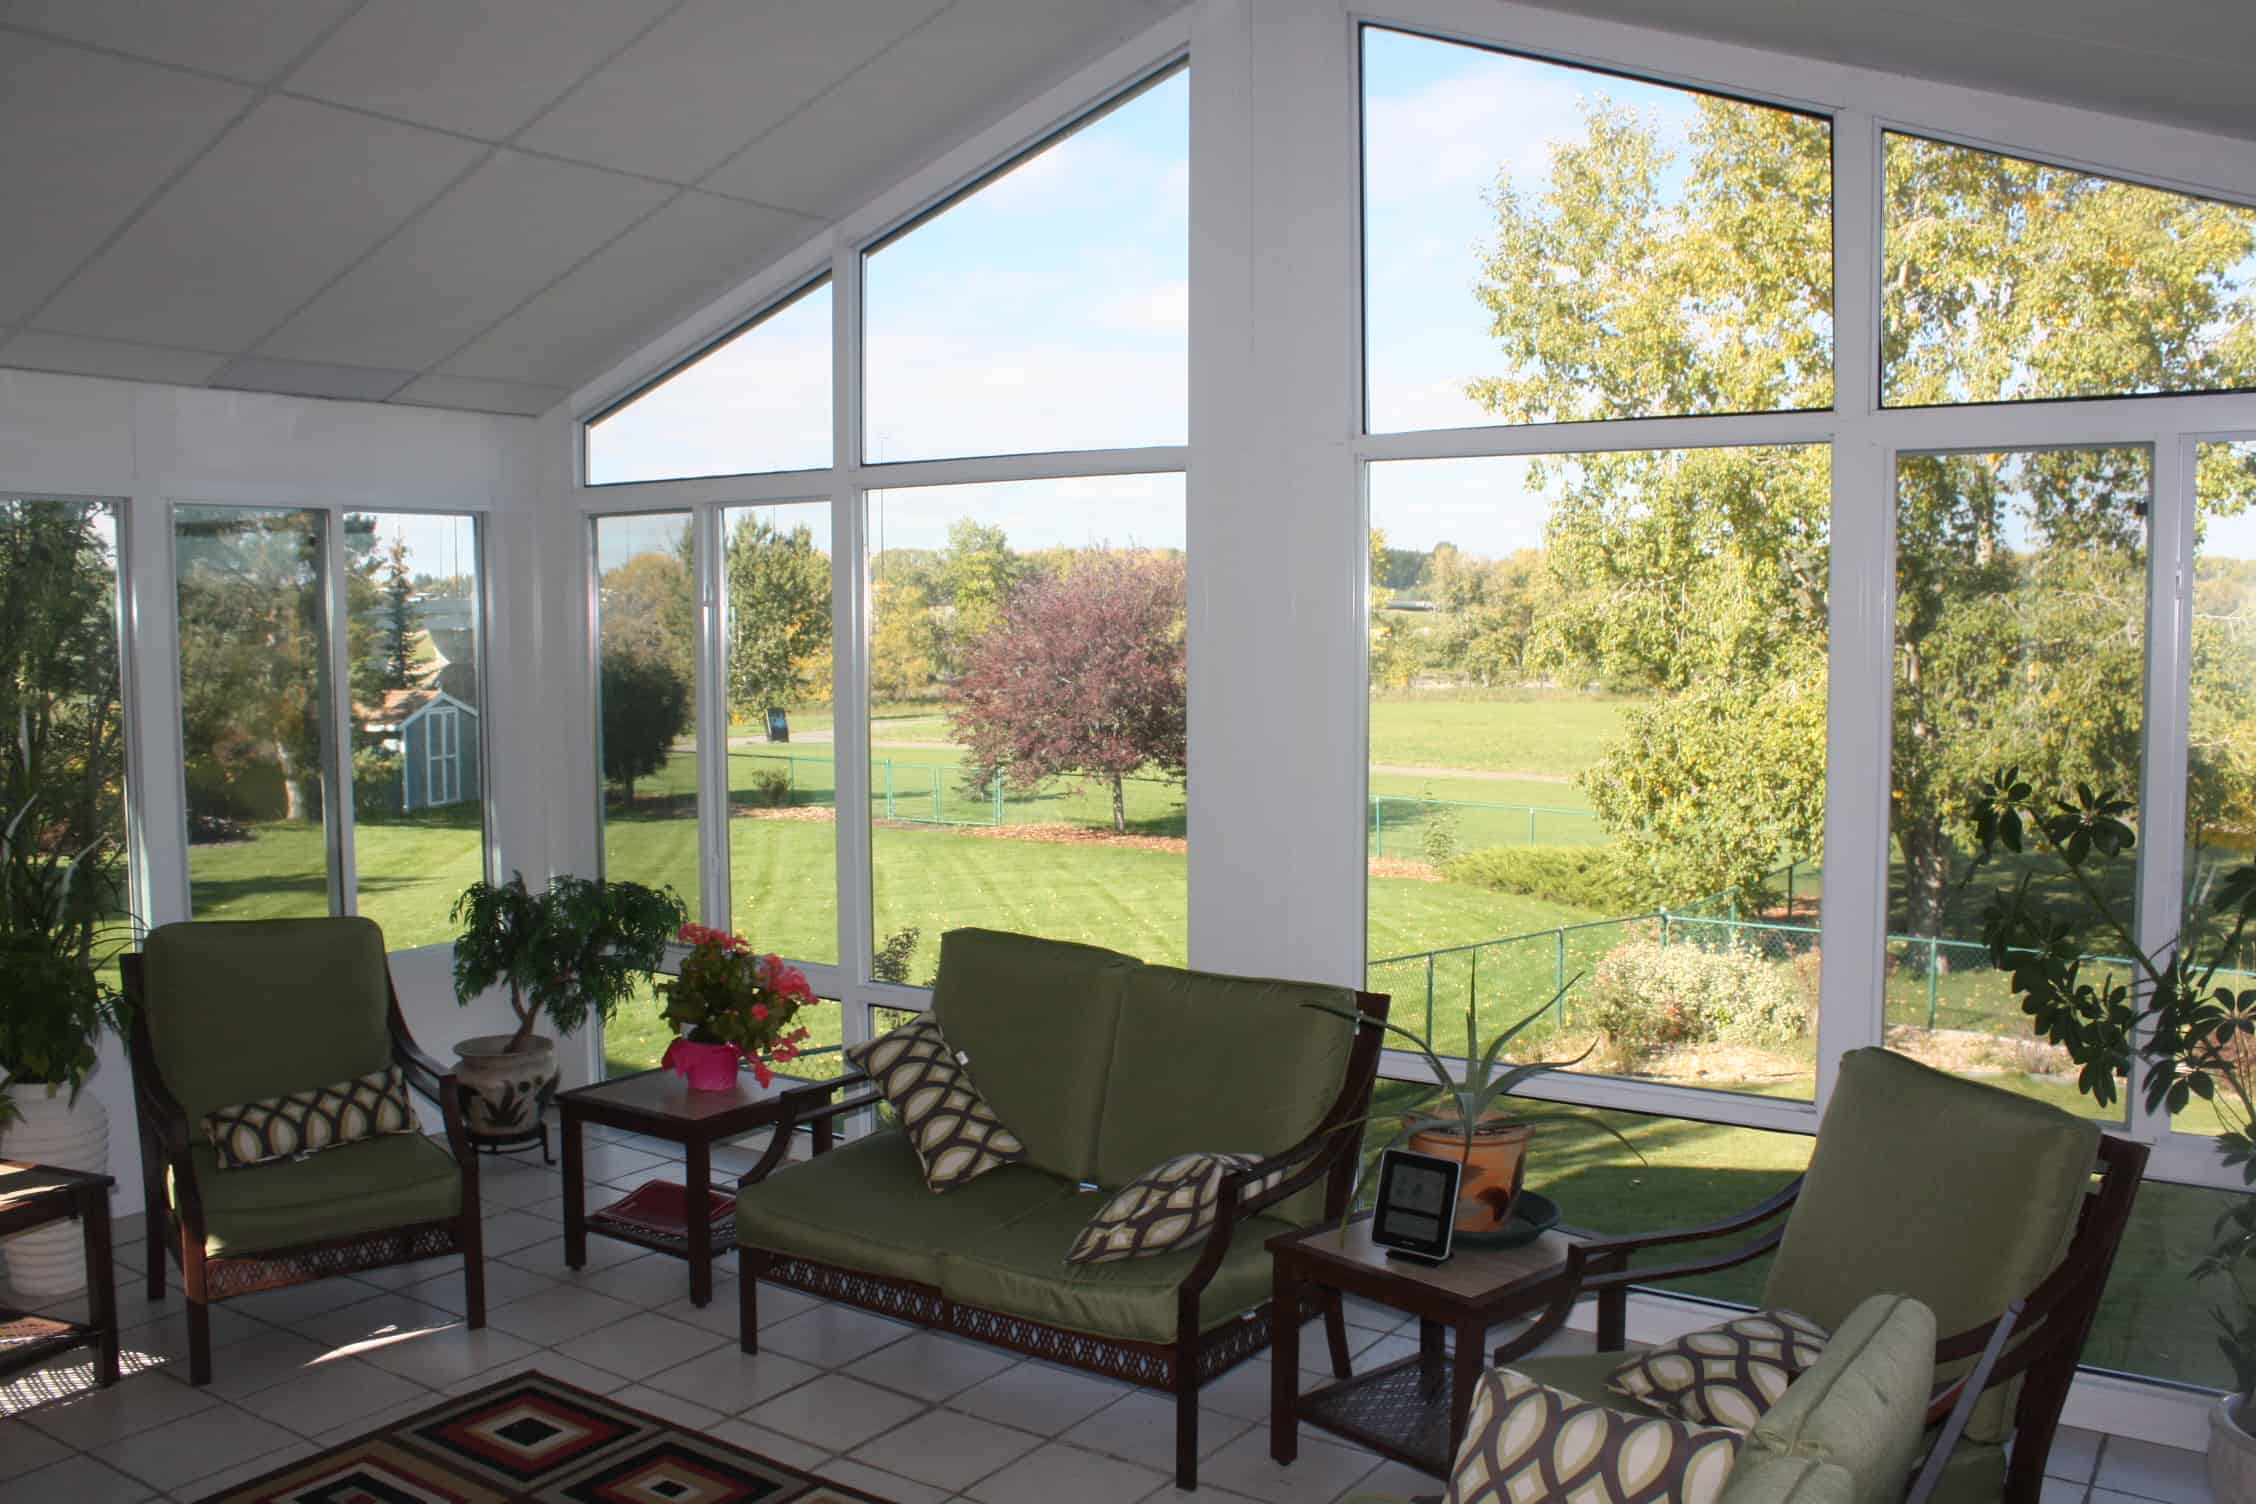 calgary sunroom images desert sun patios